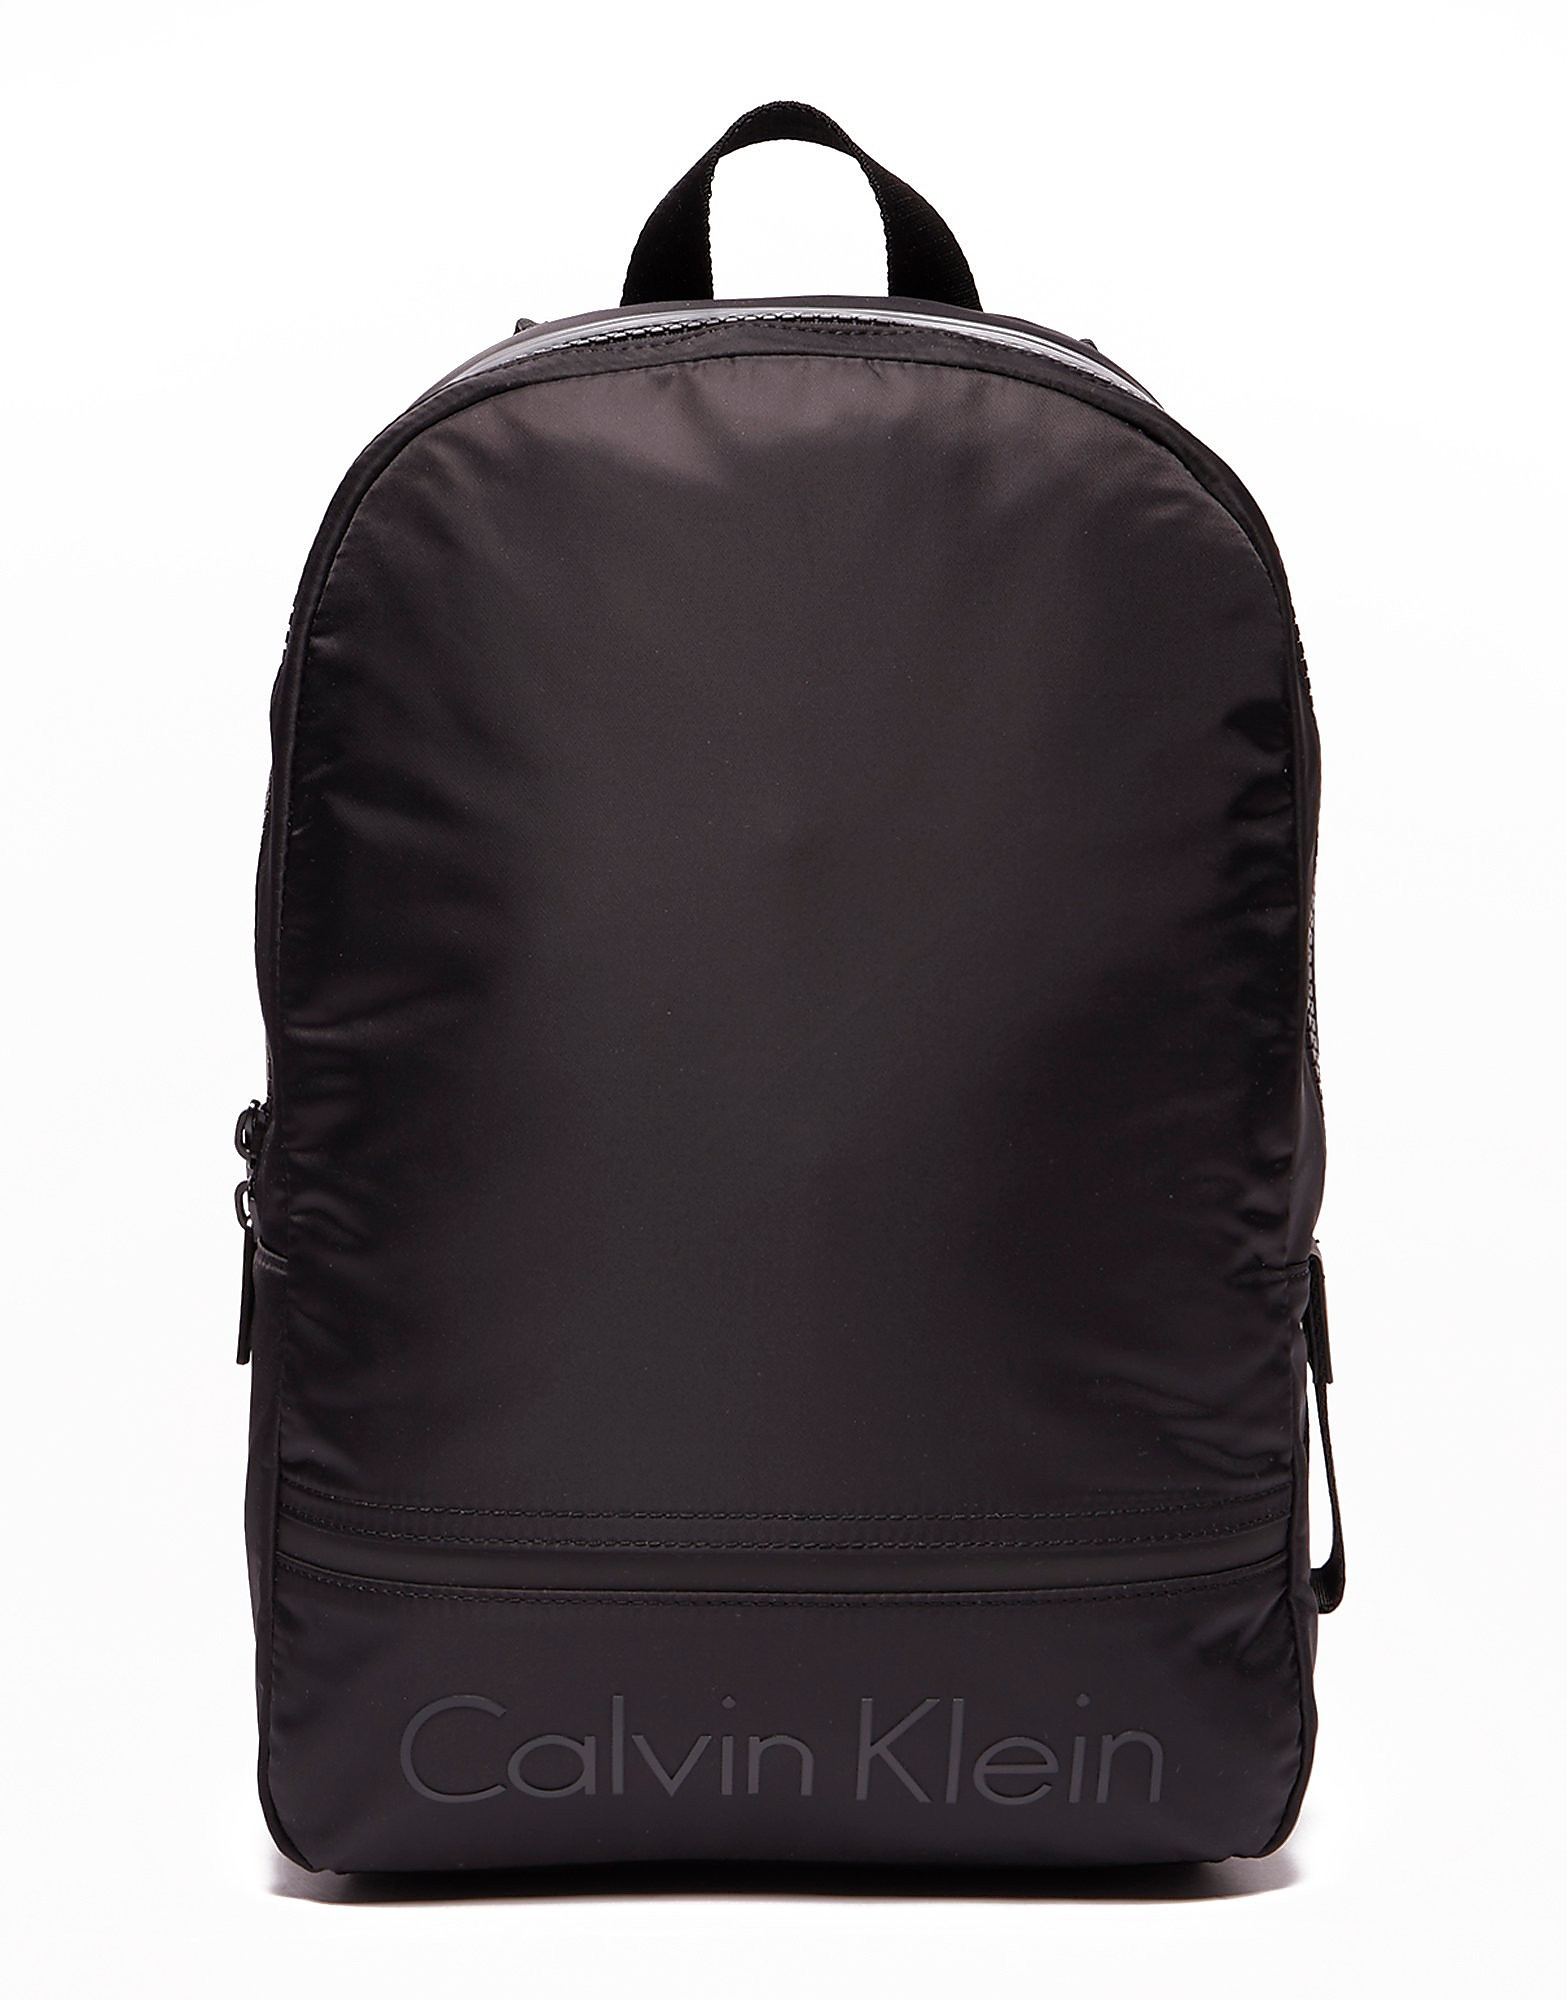 Calvin Klein Matthew Backpack